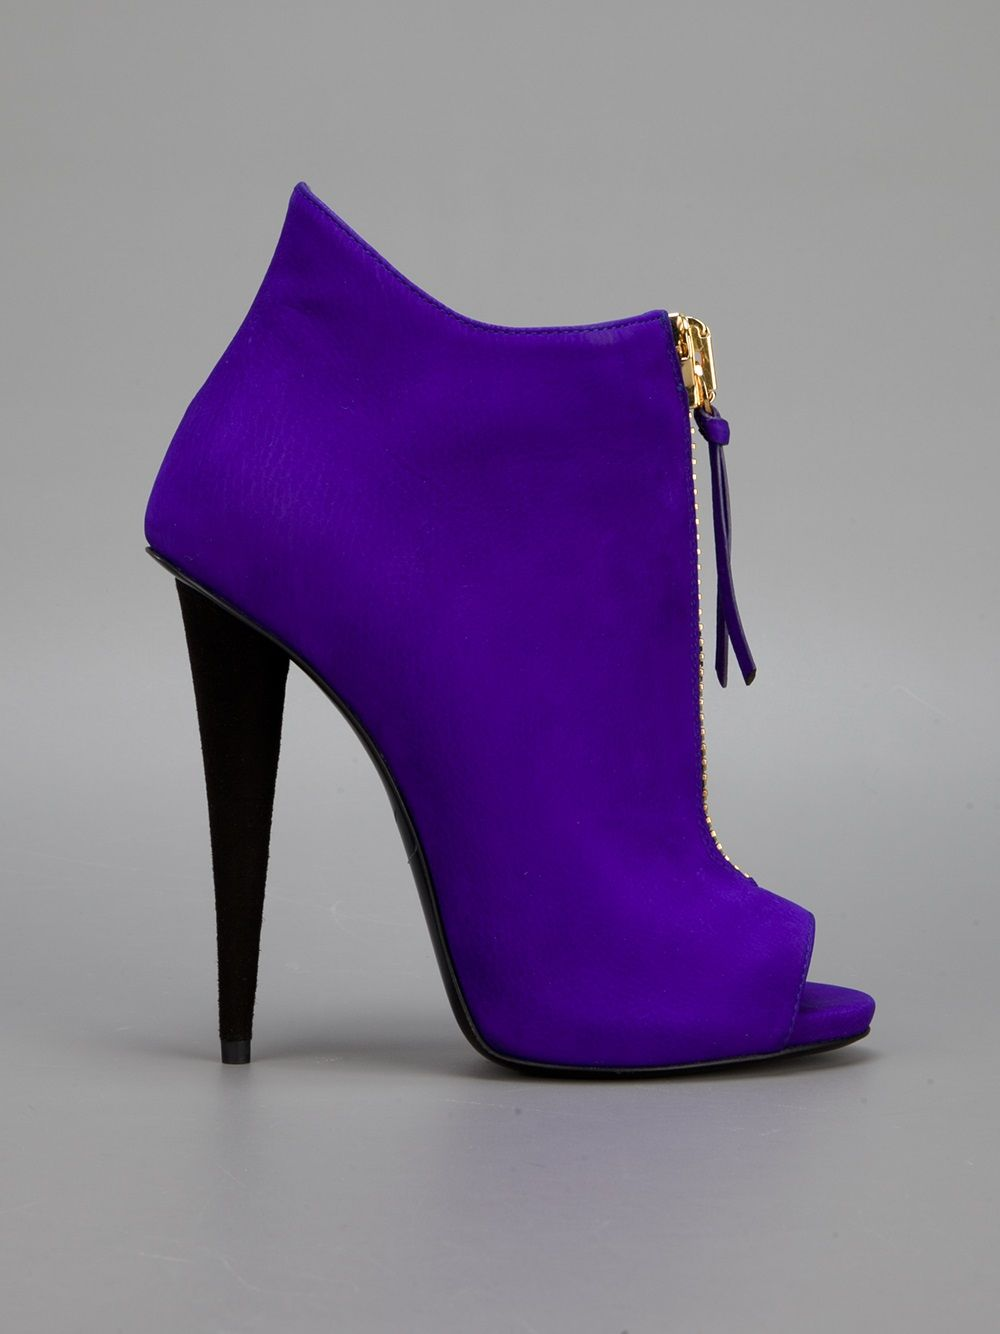 b241fe0a713ba Giuseppe Zanotti Design - Ankle boot roxa. 6   Fashion Junkie ...